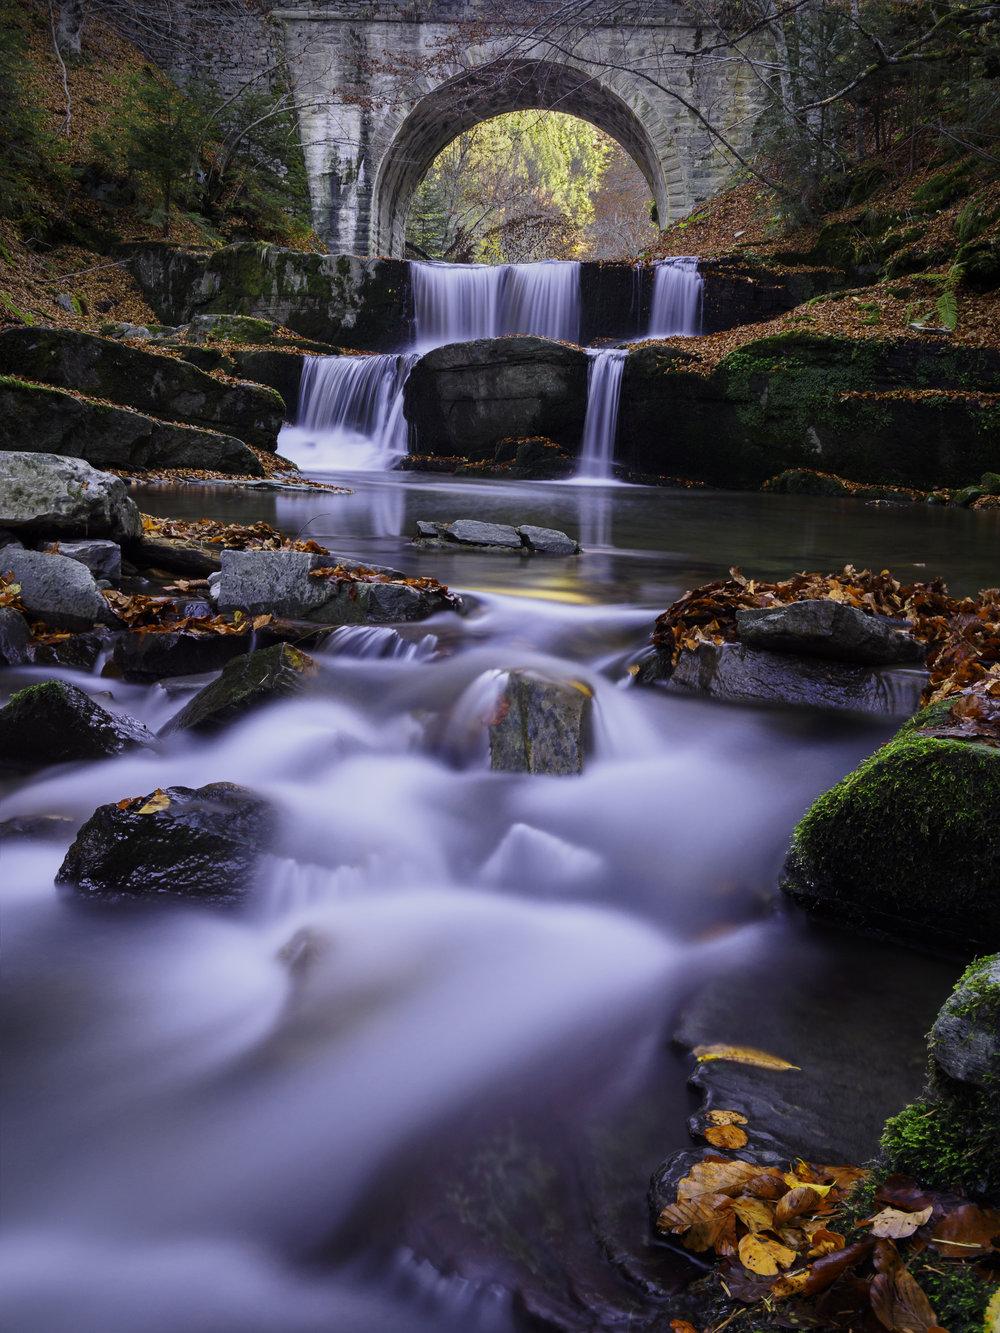 silky-water-old-bridge-autumn-colours-sitovo-waterfall-bulgaria-colours-phototour-daniel-2018-portraiVer-1(Print).jpg